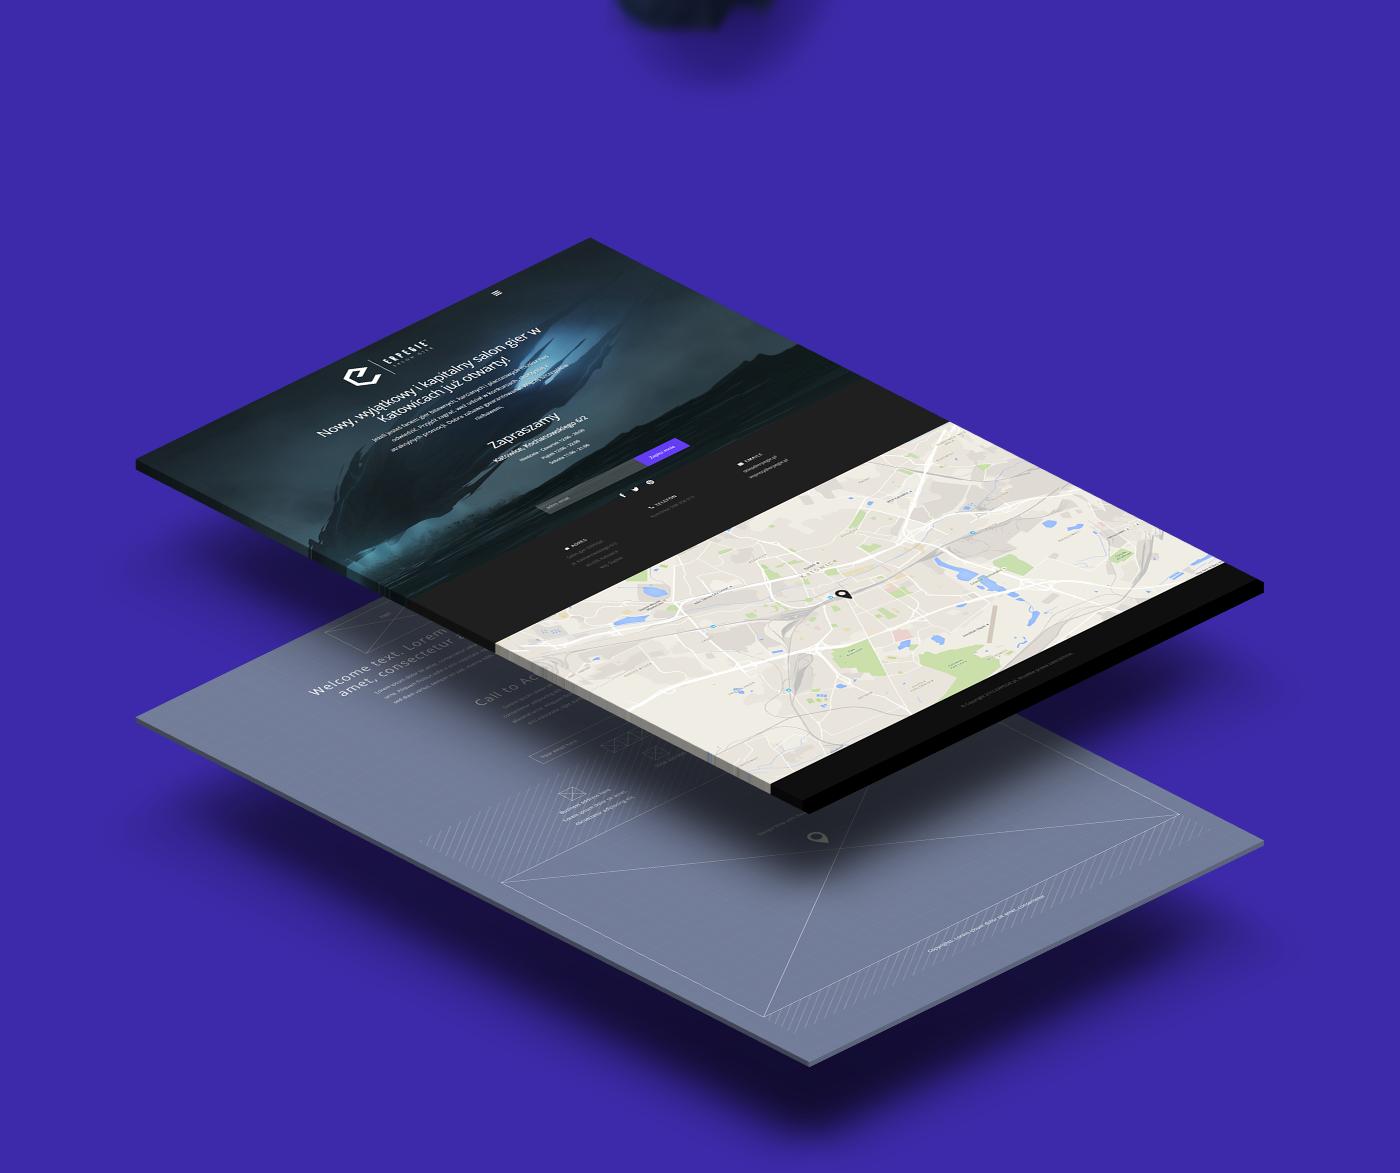 ERPEGIE-web-design-ux-ui-responsive-2015_07